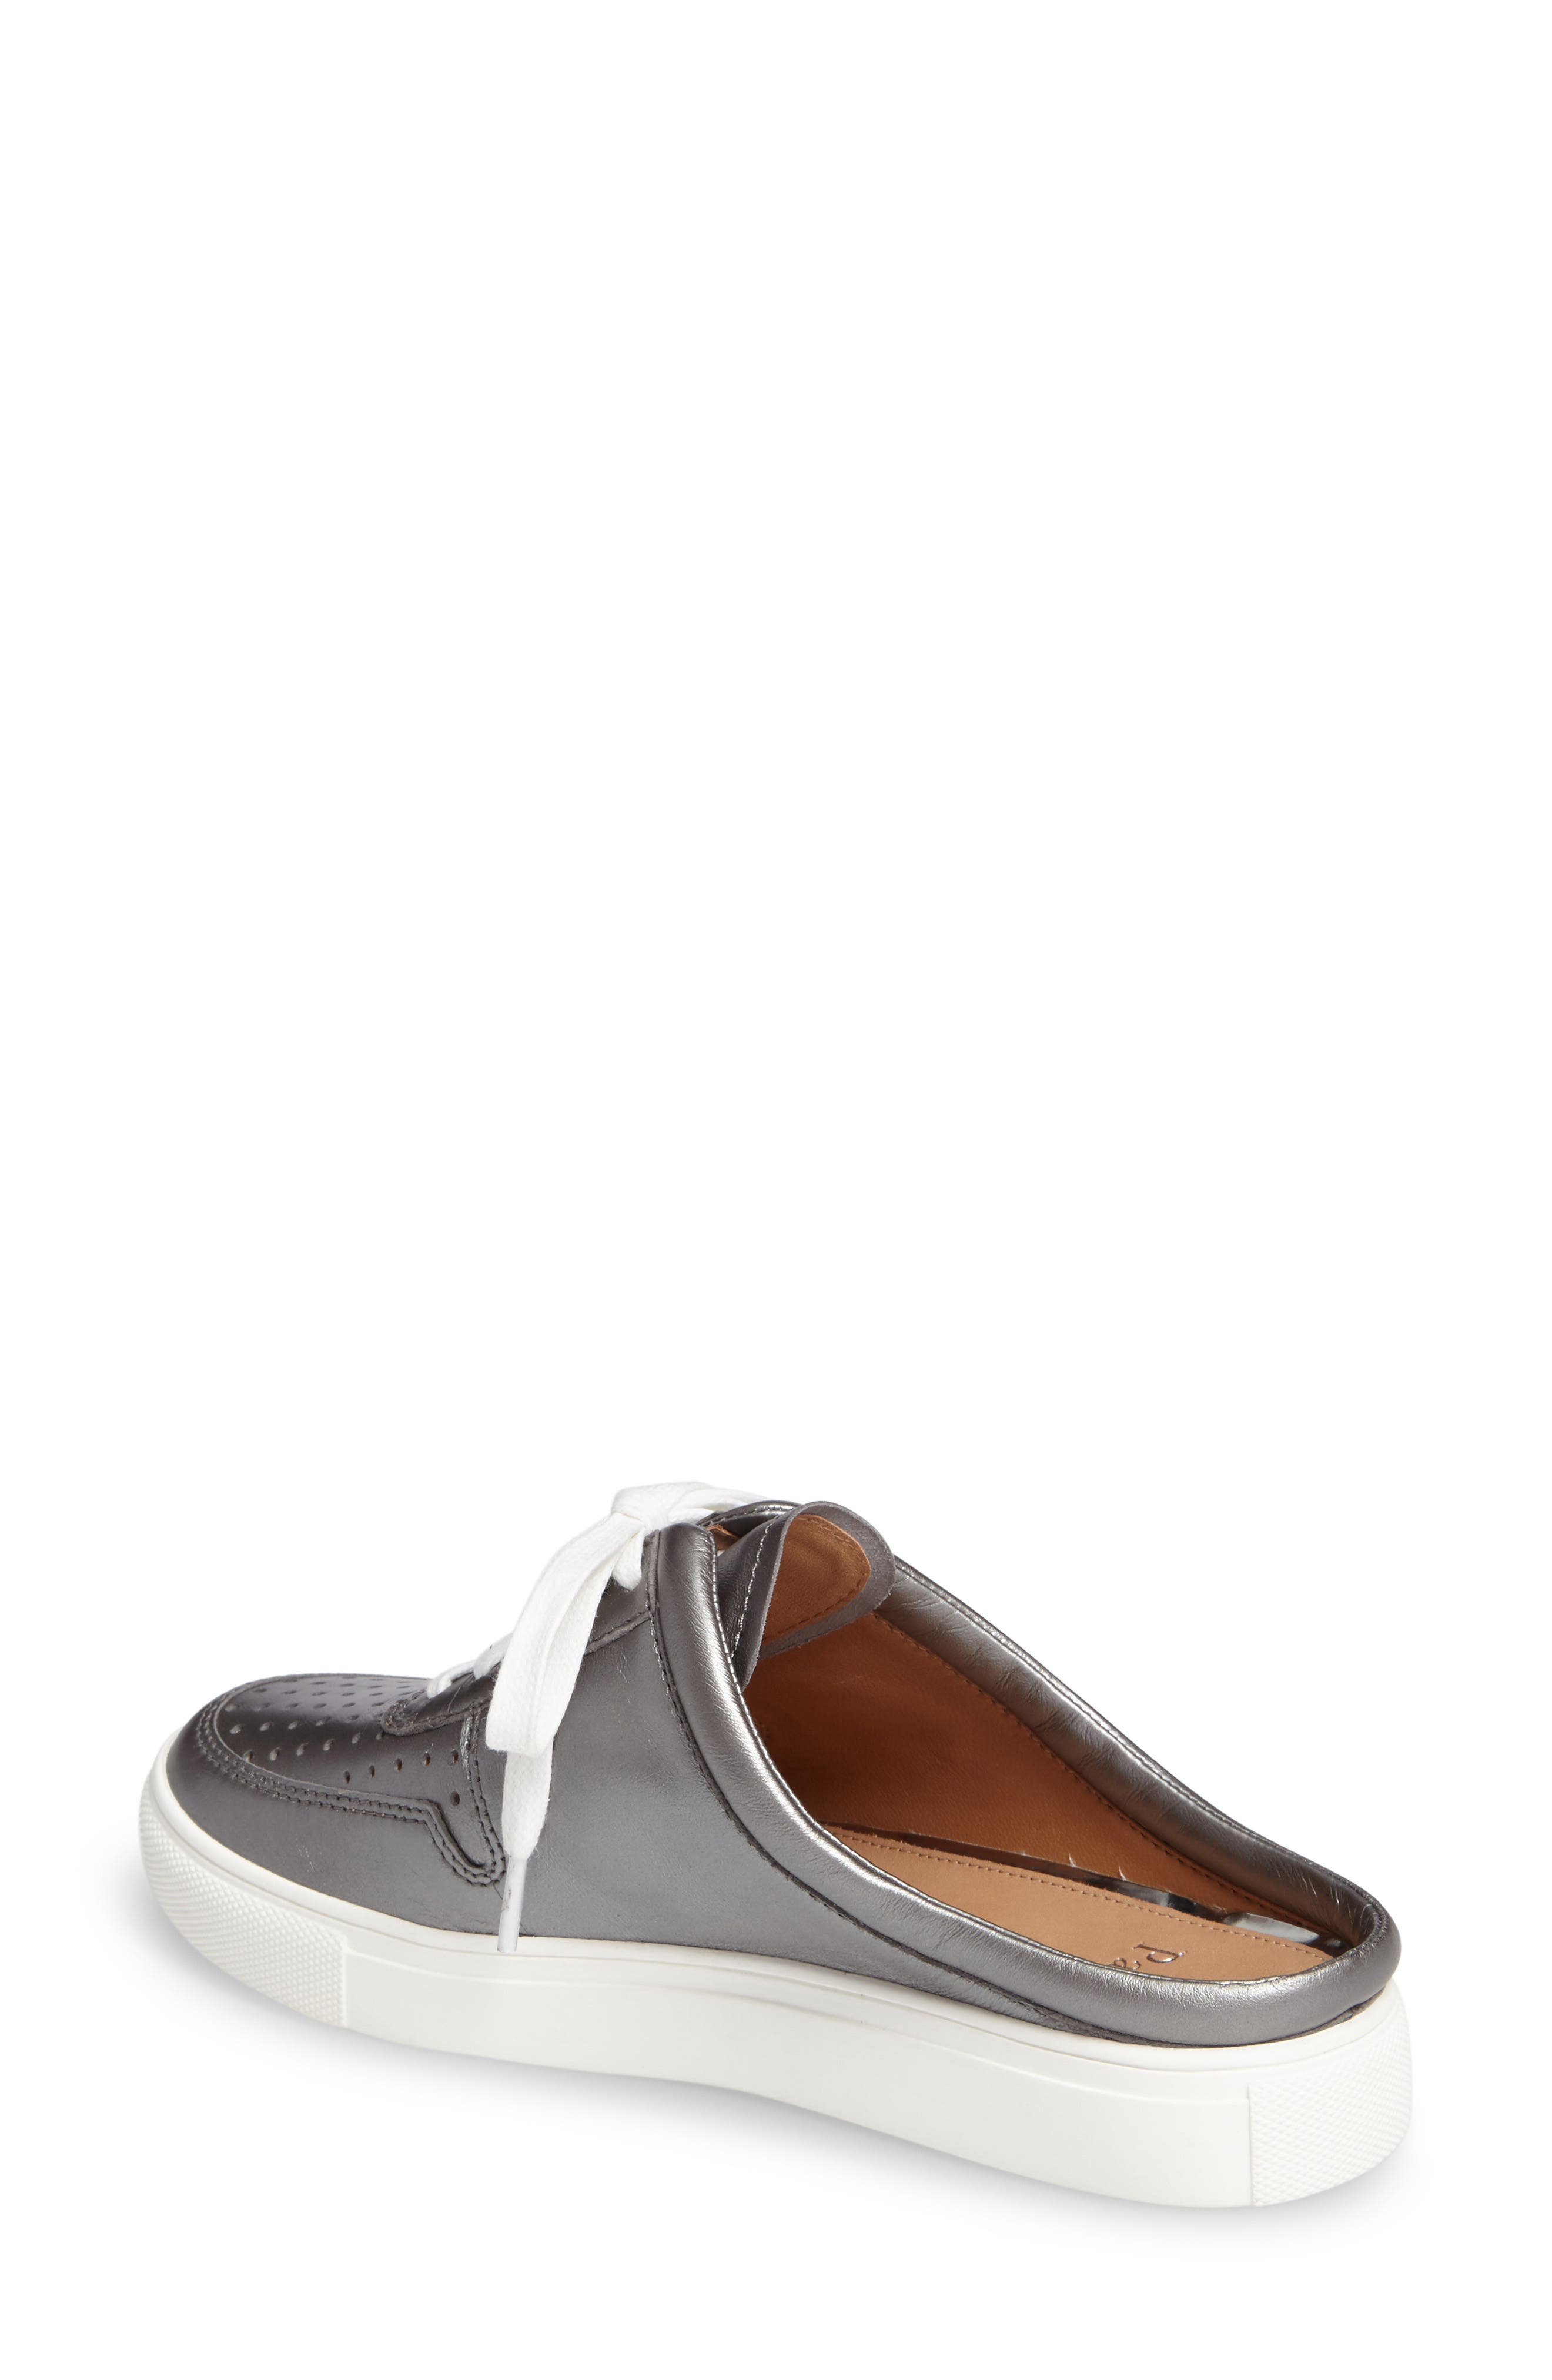 Kacy Perforated Slide Sneaker,                             Alternate thumbnail 2, color,                             040